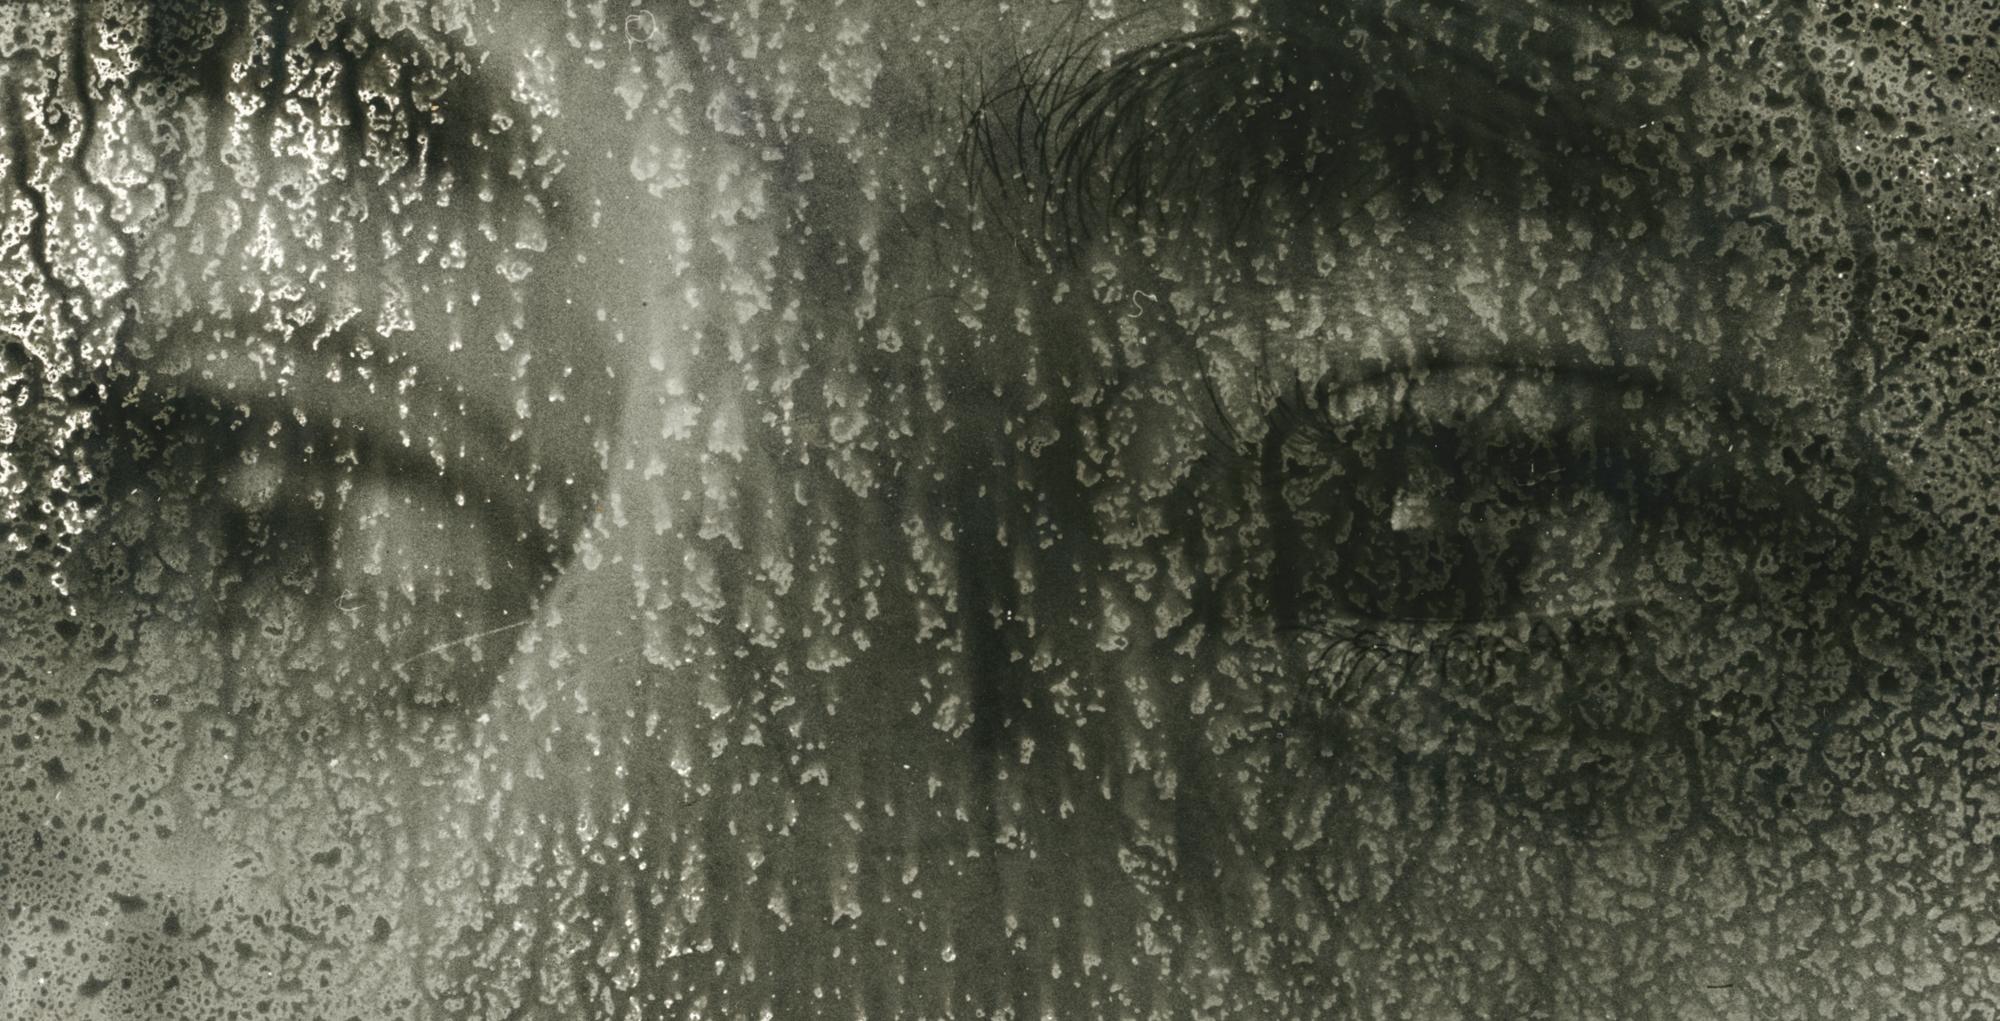 spraydev-8.jpg